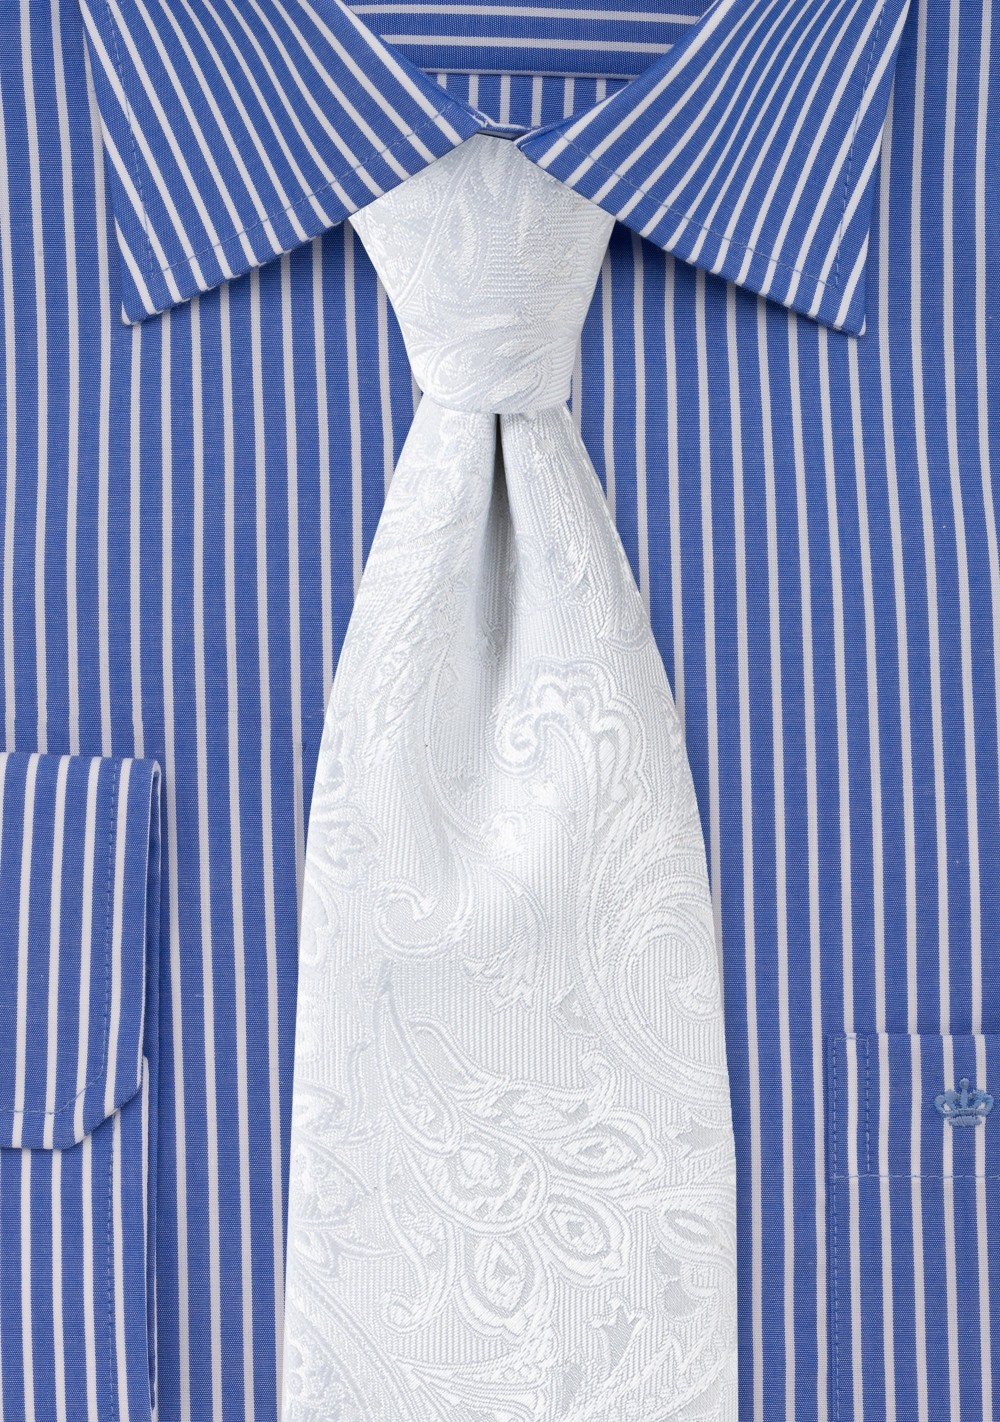 Bright White Paisley Tie in XXL